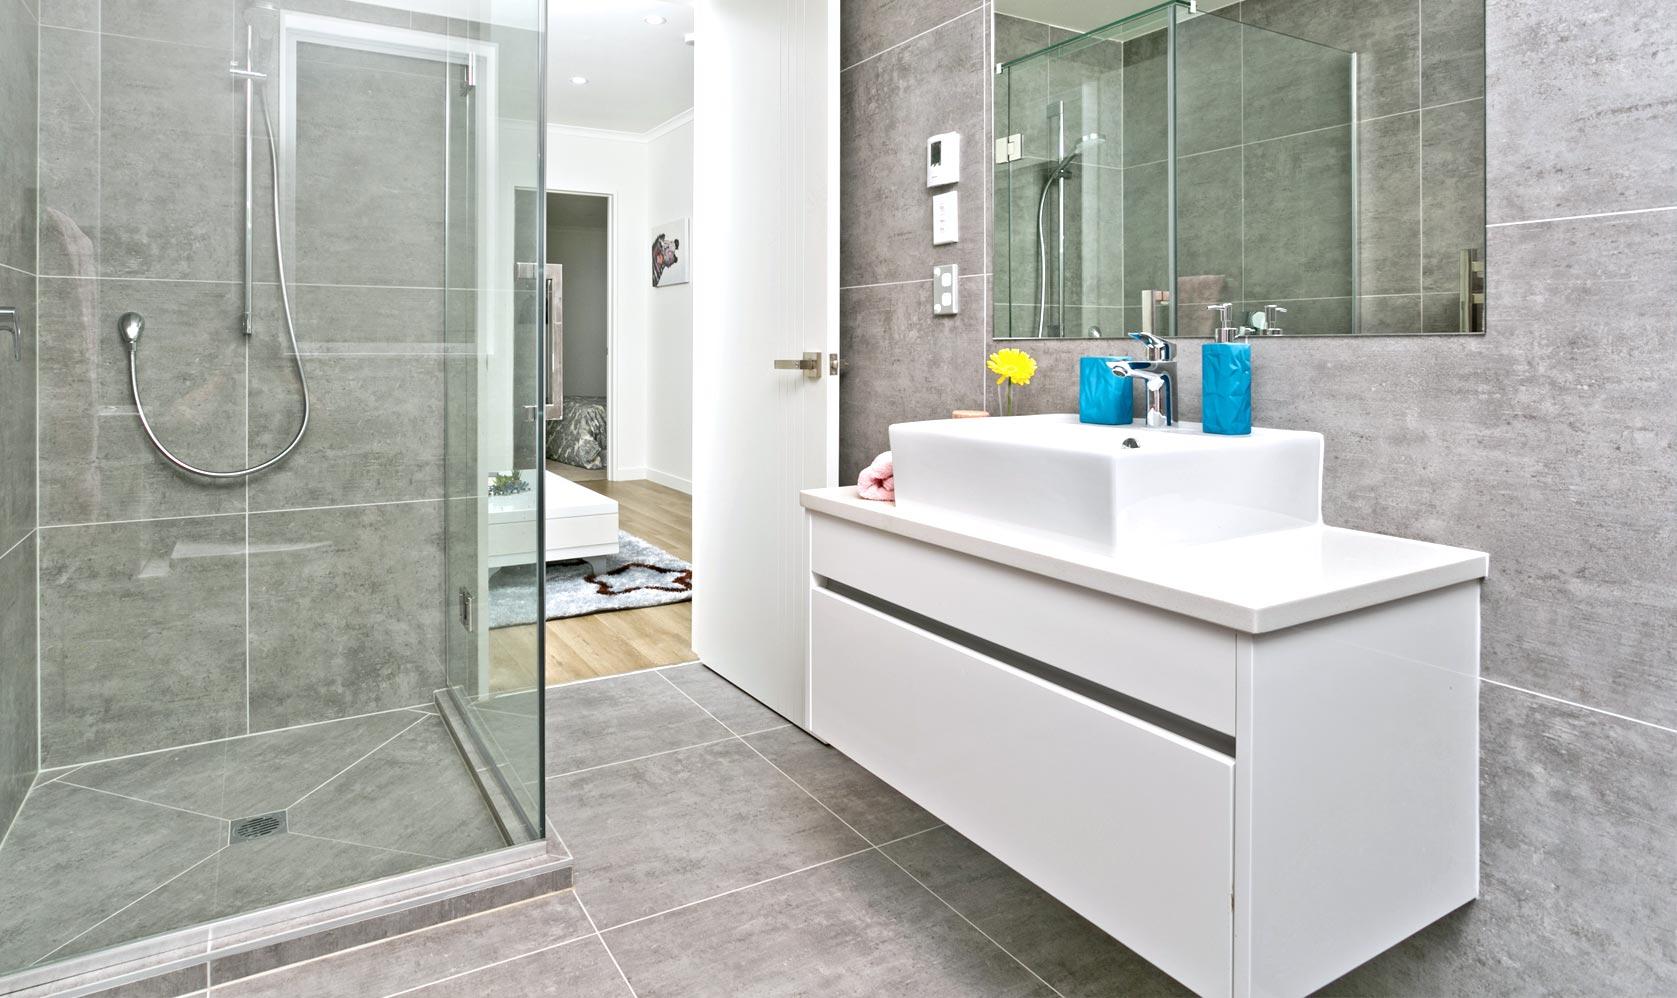 bg-slide2, Kitchen Renovation, Bathroom Renovation, House Renovation Auckland